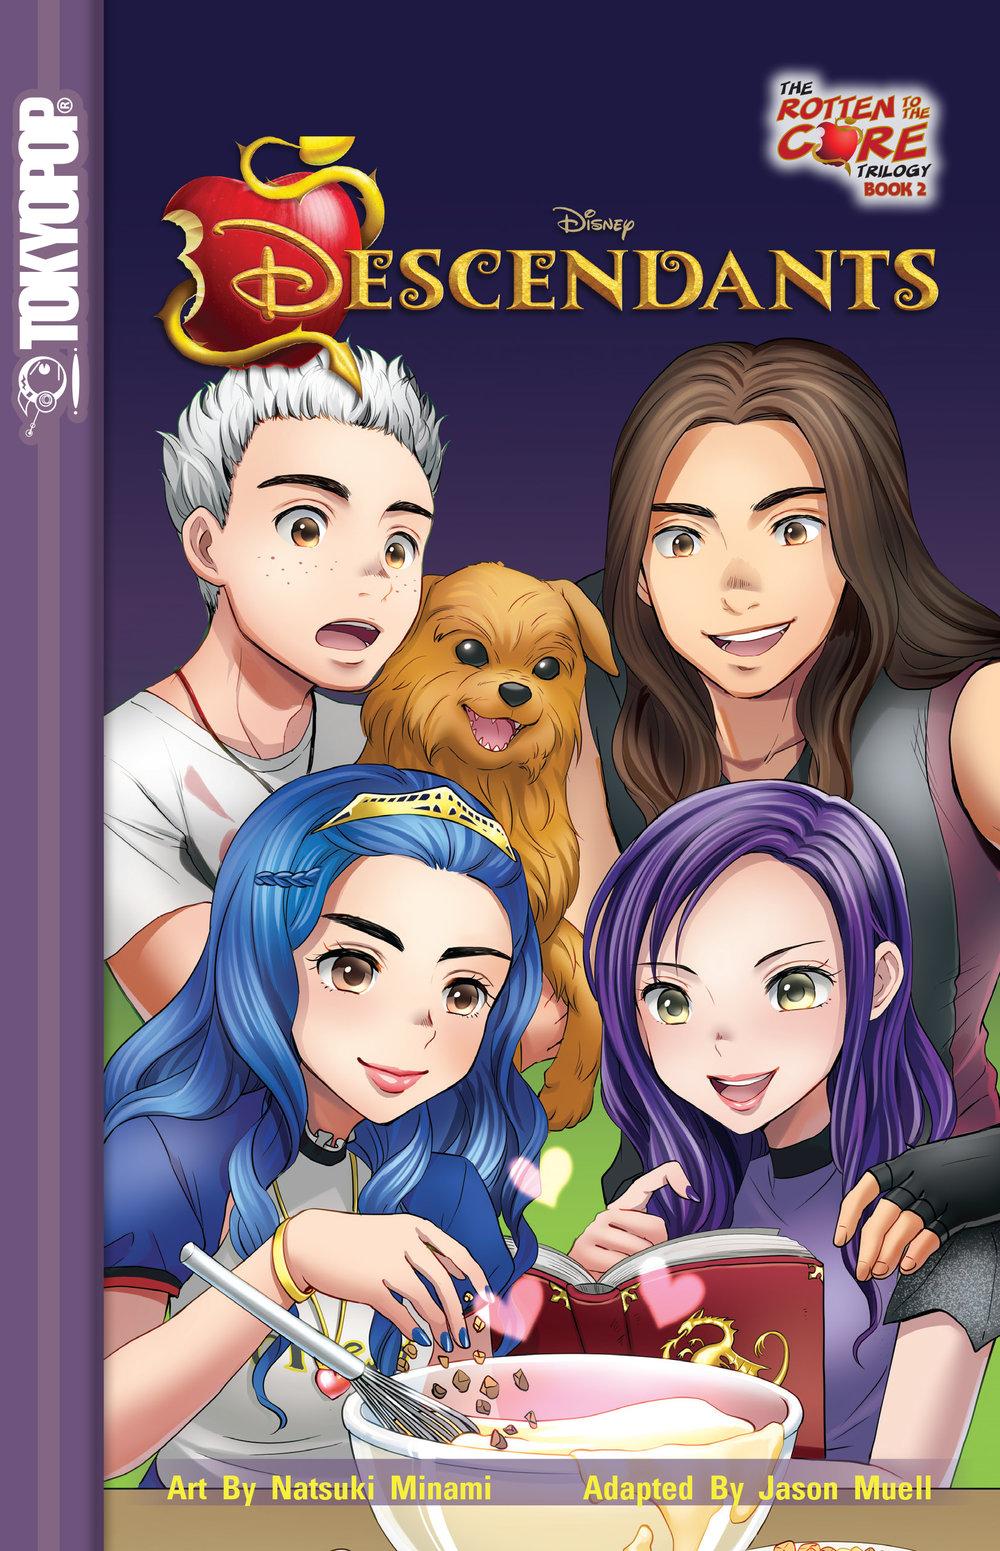 DISNEY DESCENDANTS: THE ROTTEN TO THE CORE TRILOGY (VOLUME 2)